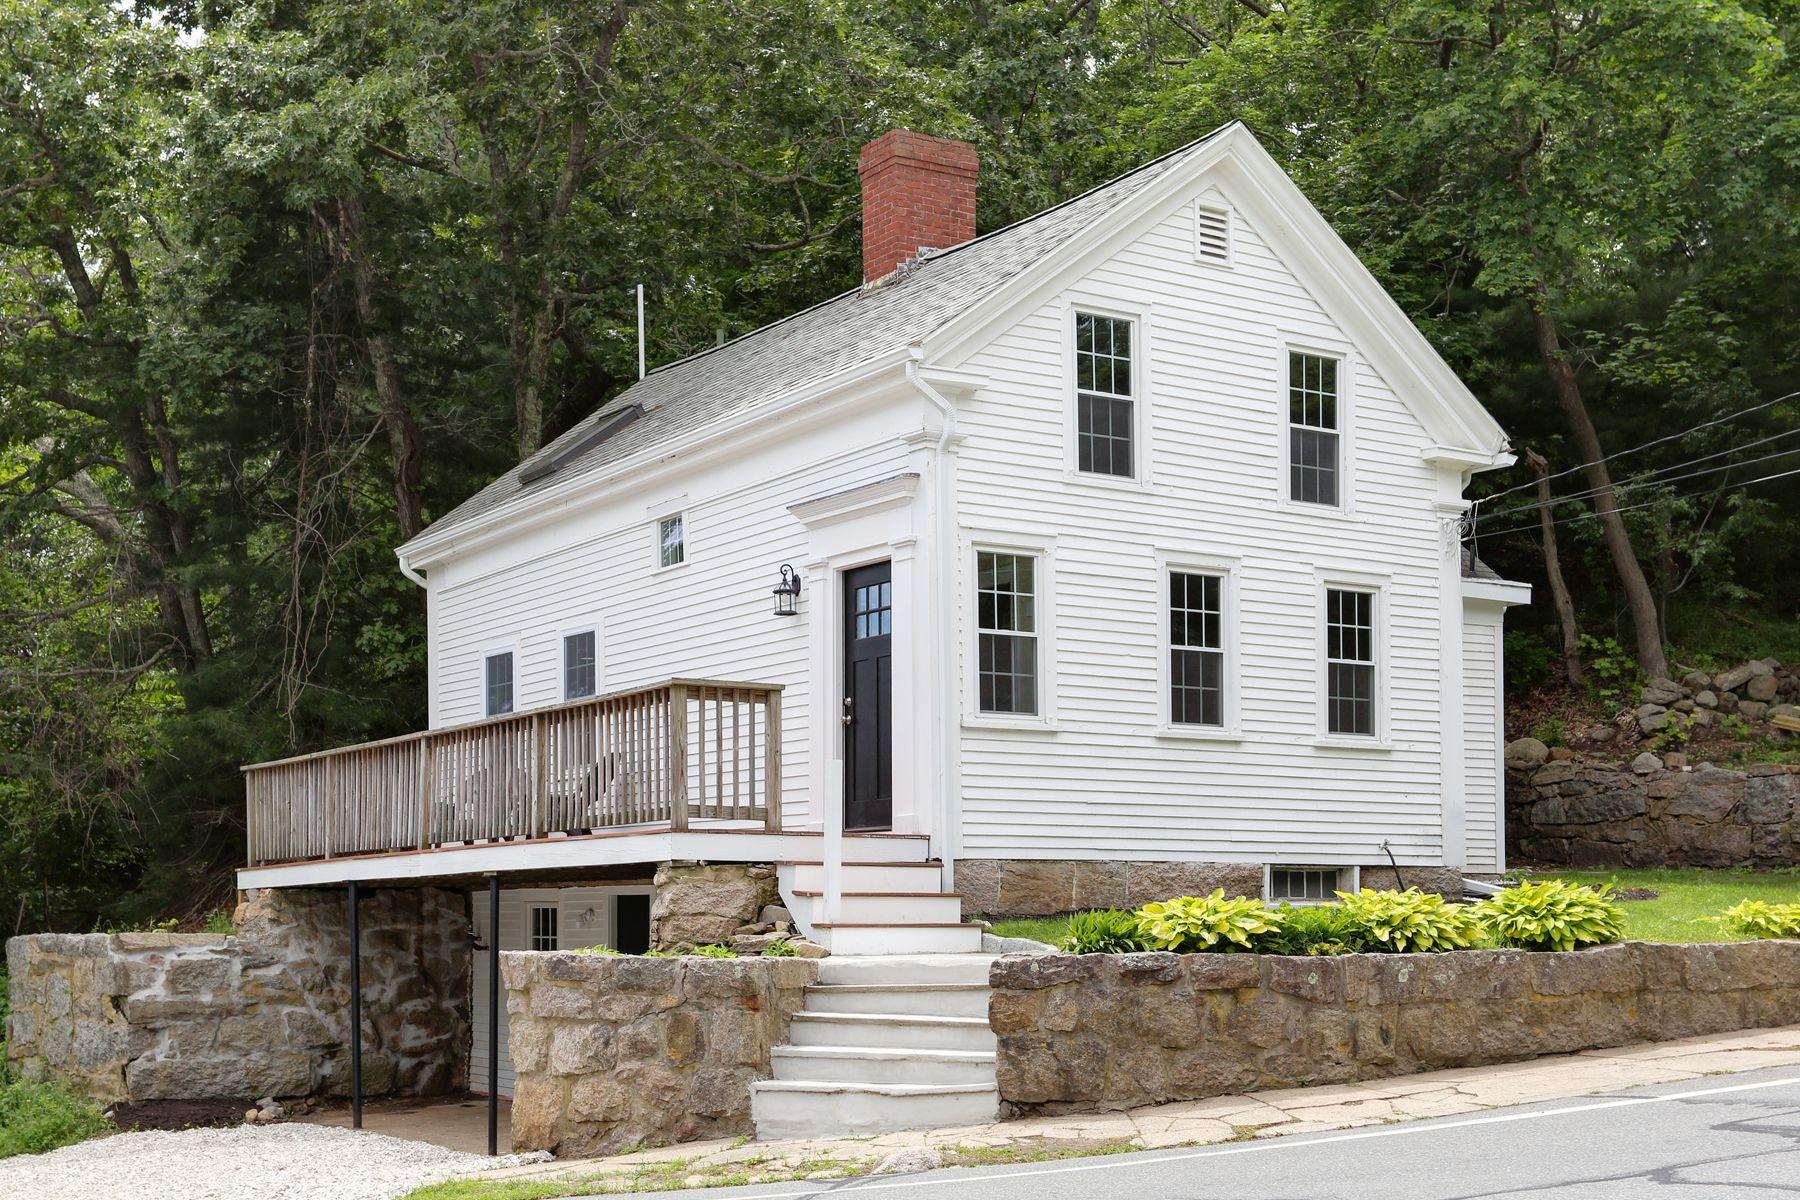 Single Family Homes for Sale at 27 Herring Pond Road Bourne, Massachusetts 02532 United States